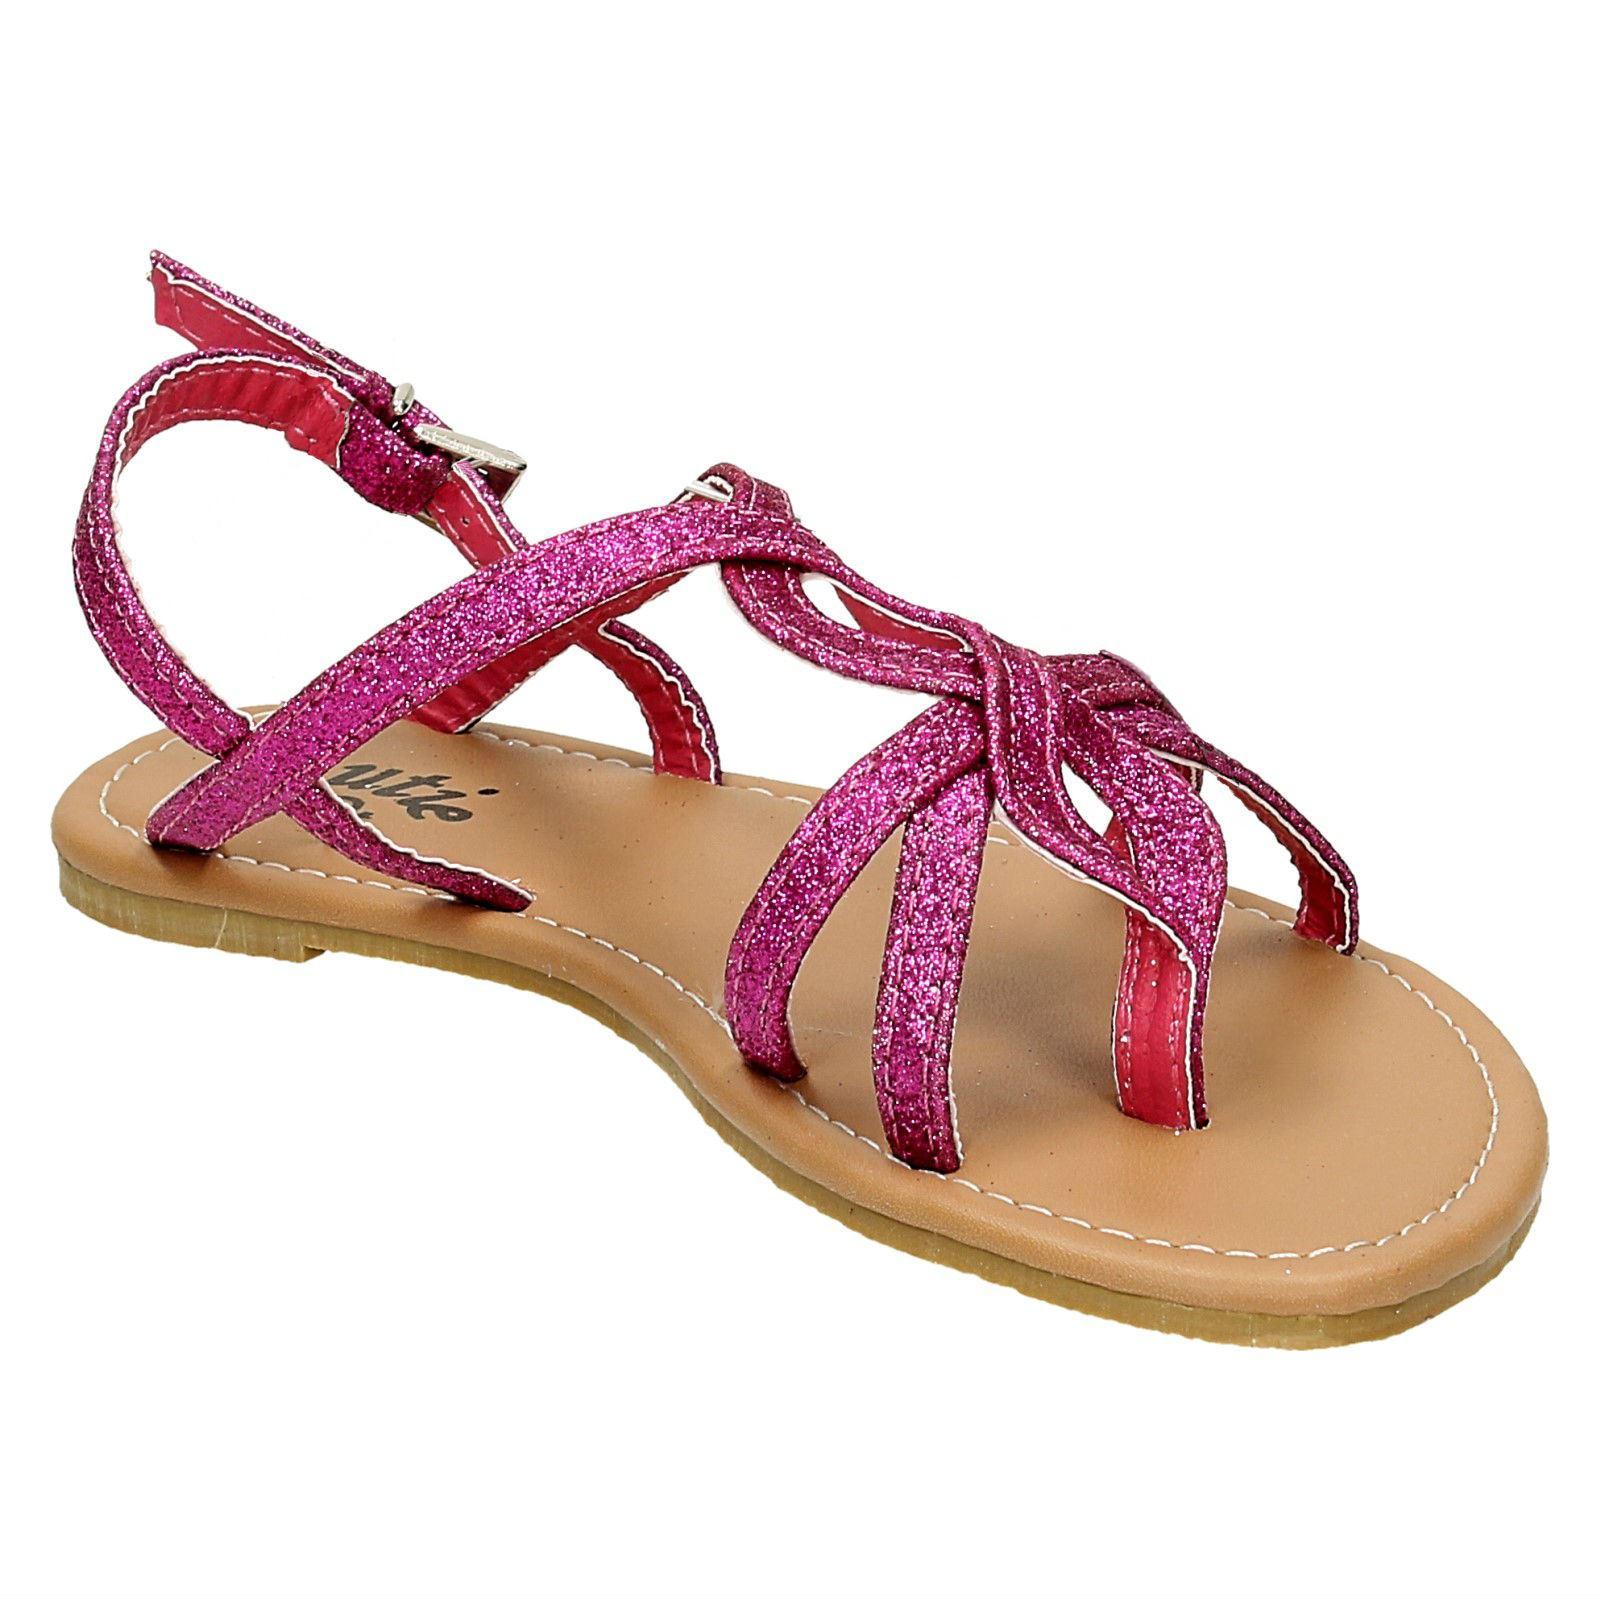 Chicas Cutie Tejido Glitter Toe Post Sandalias